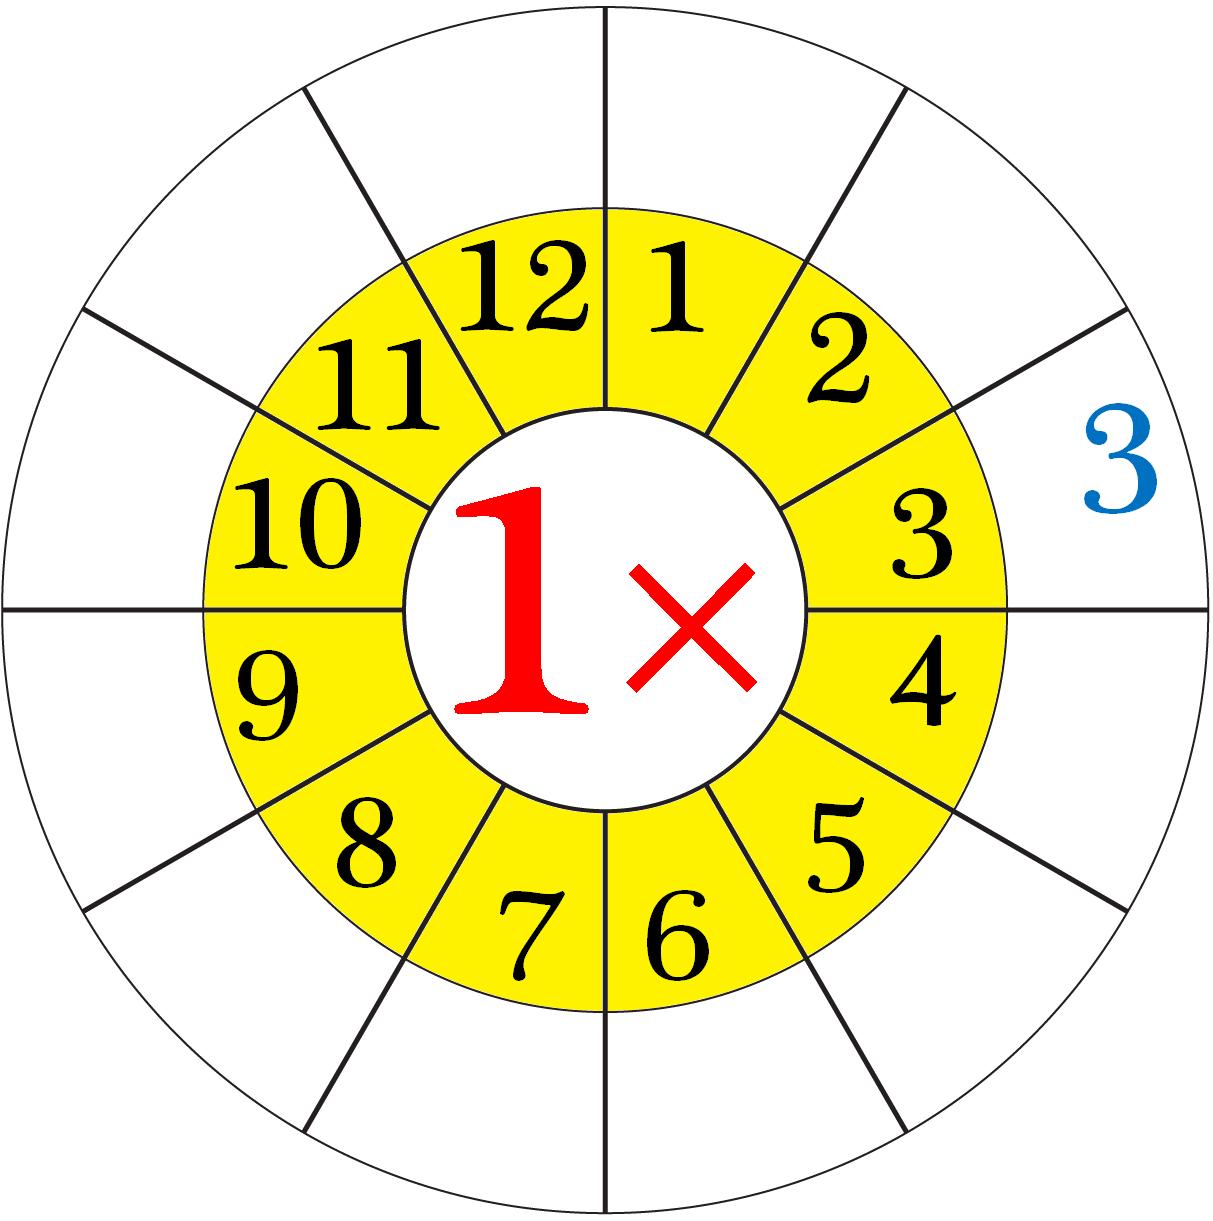 Worksheet on Multiplication Table of 1